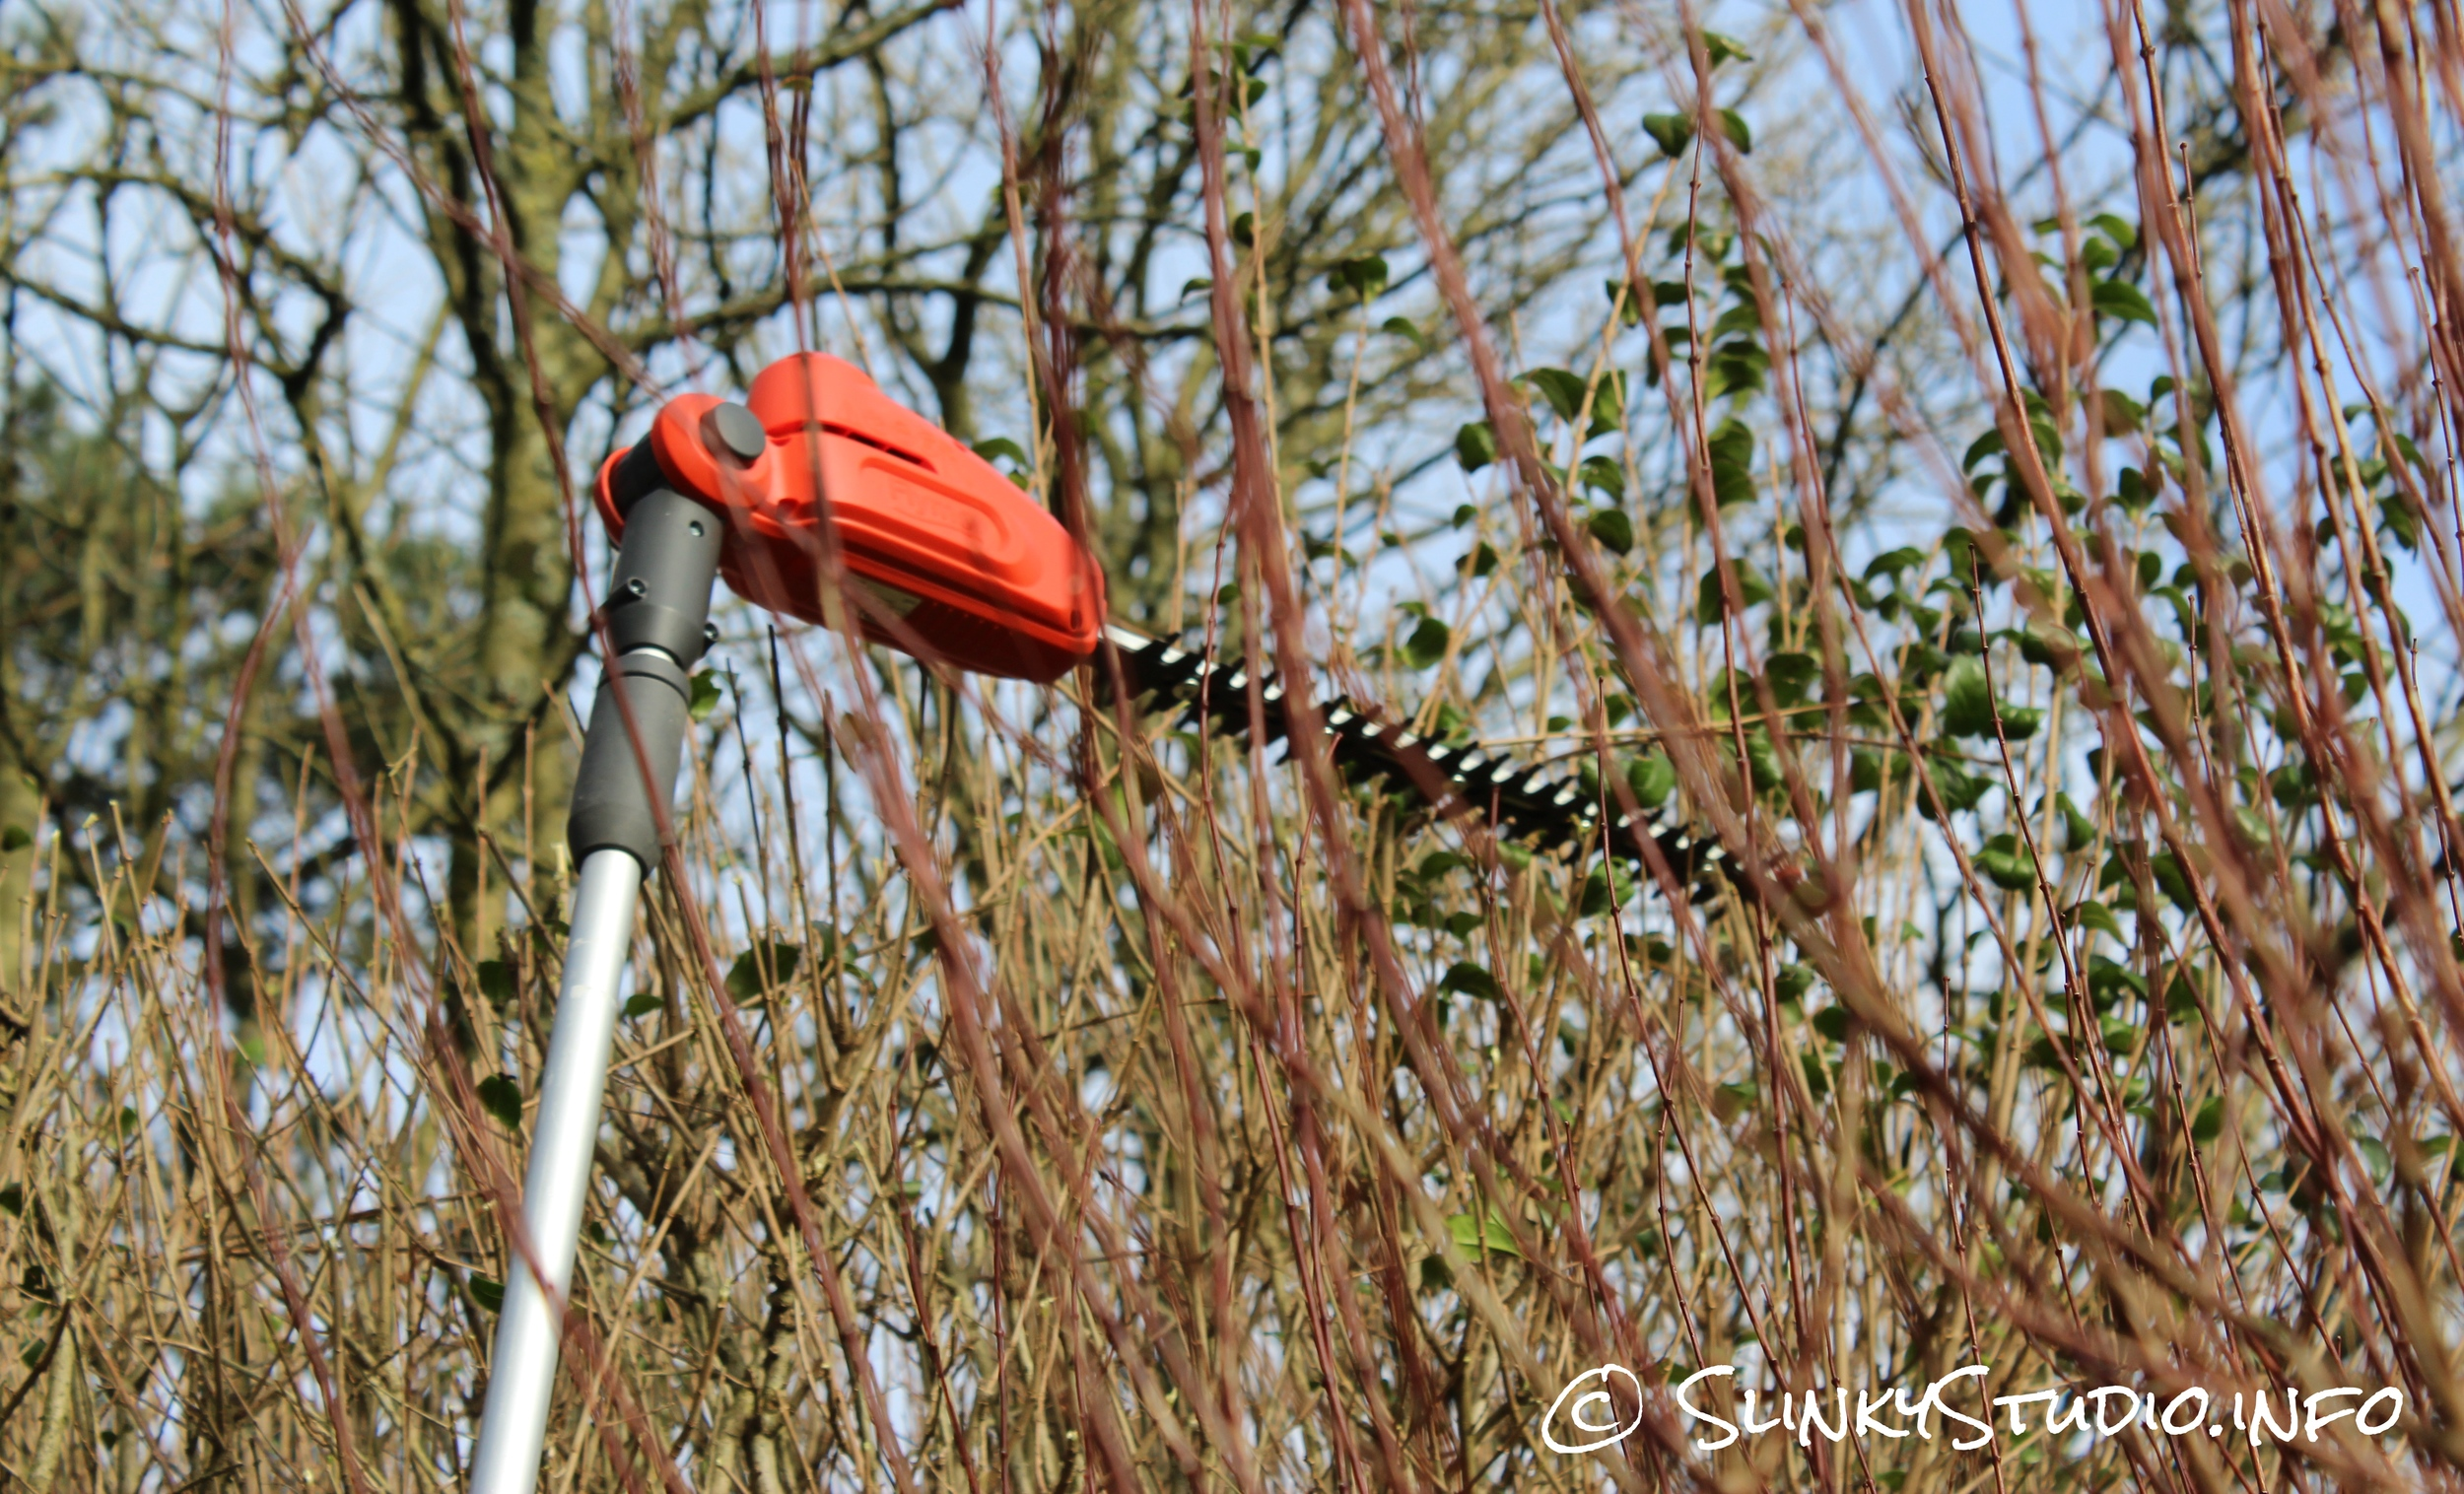 Flymo SabreCut XT Cordless Hedge Trimmer Through Hedge View.jpg